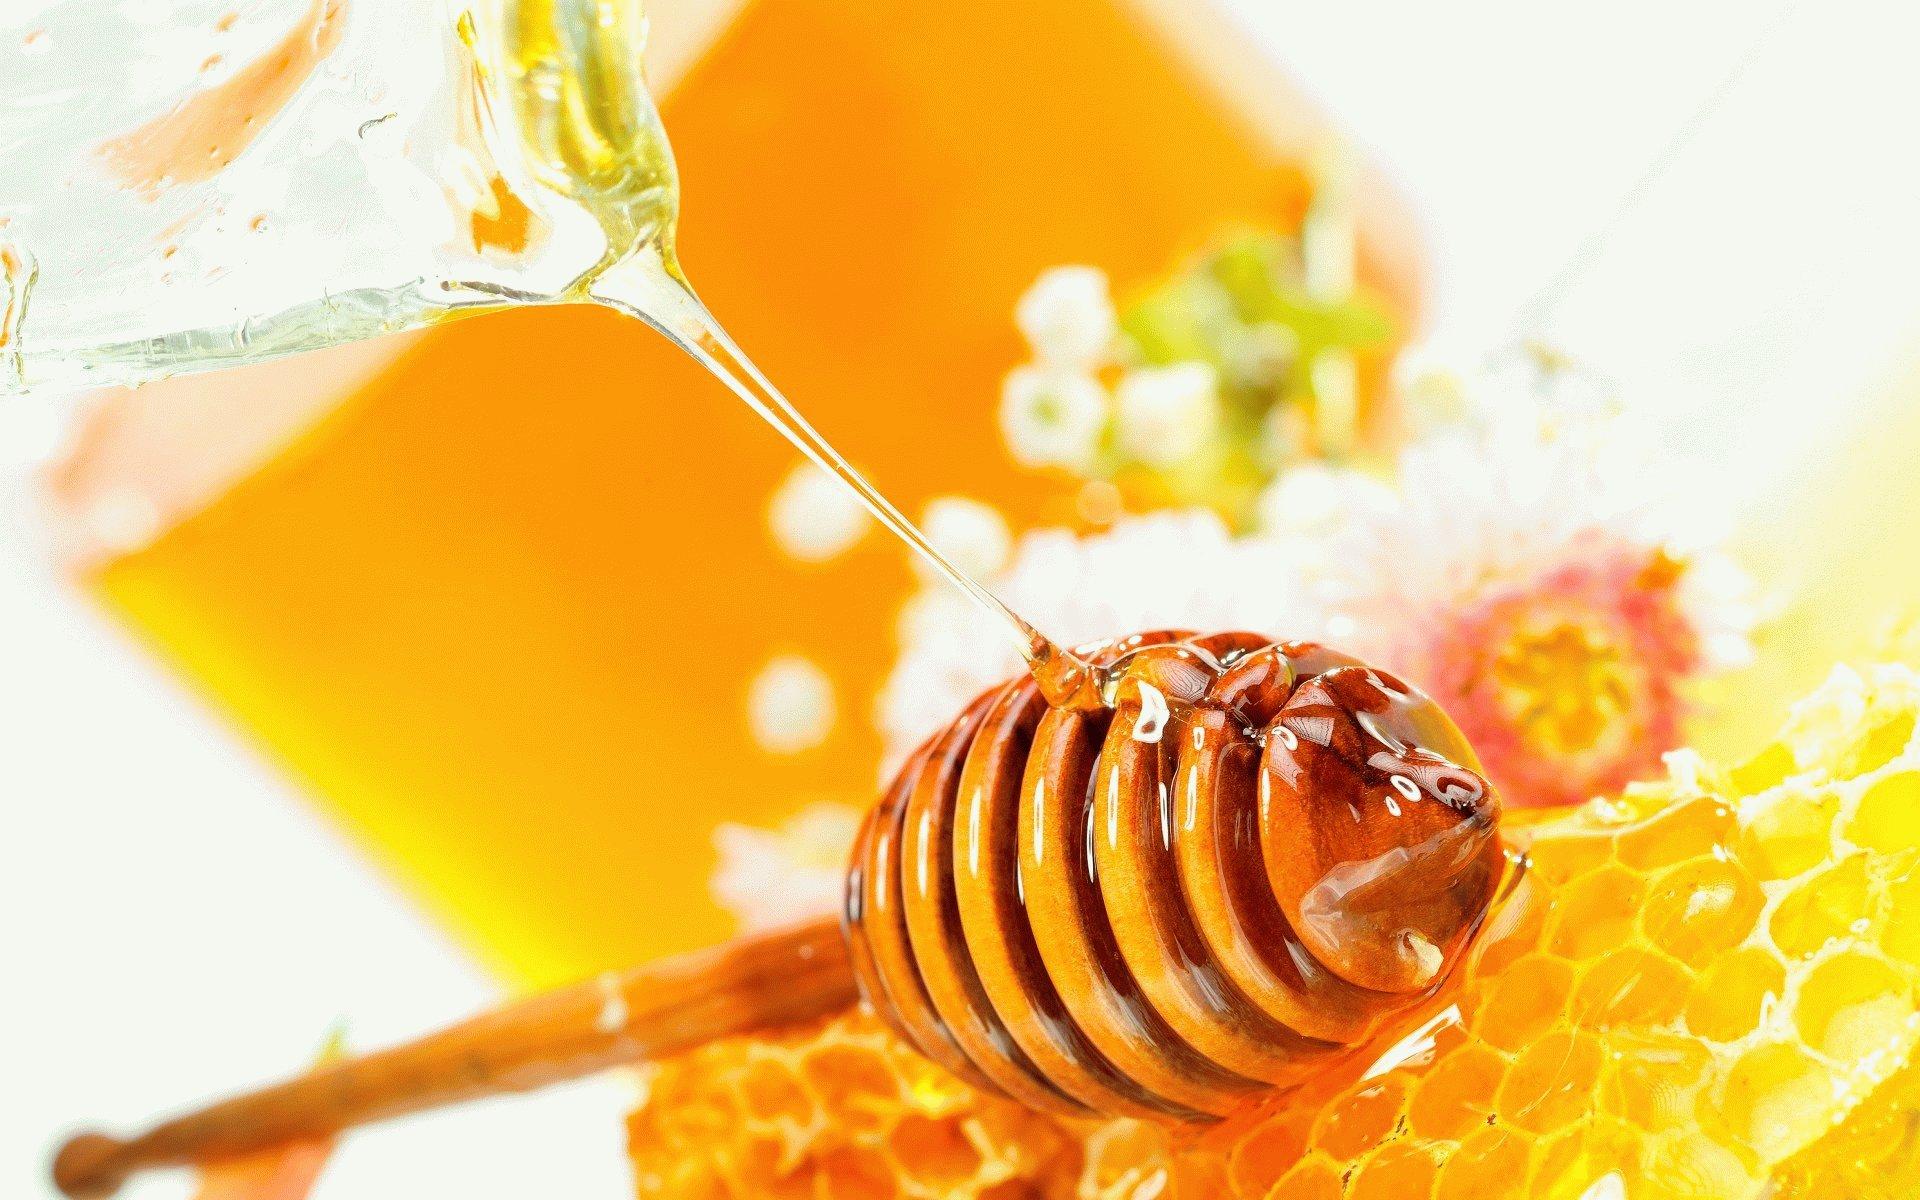 Мед при гастрите: можно или нет